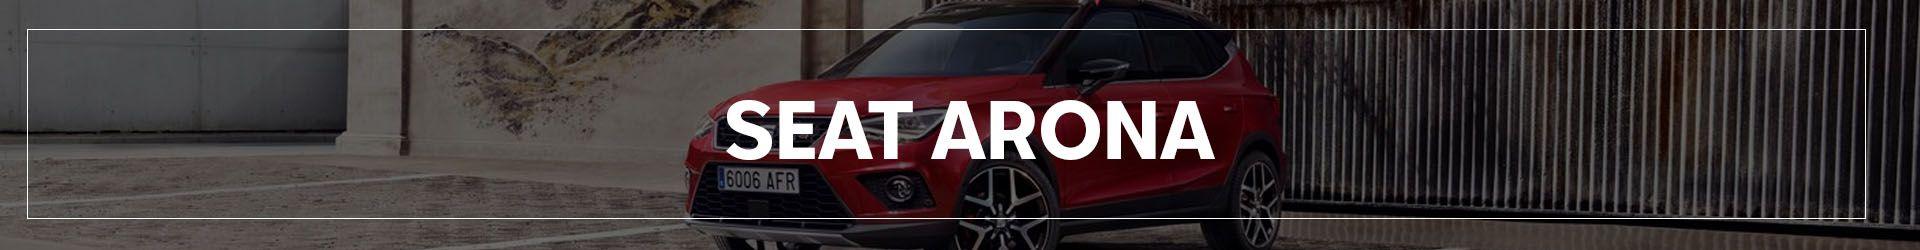 Seat Arona cabecera Web